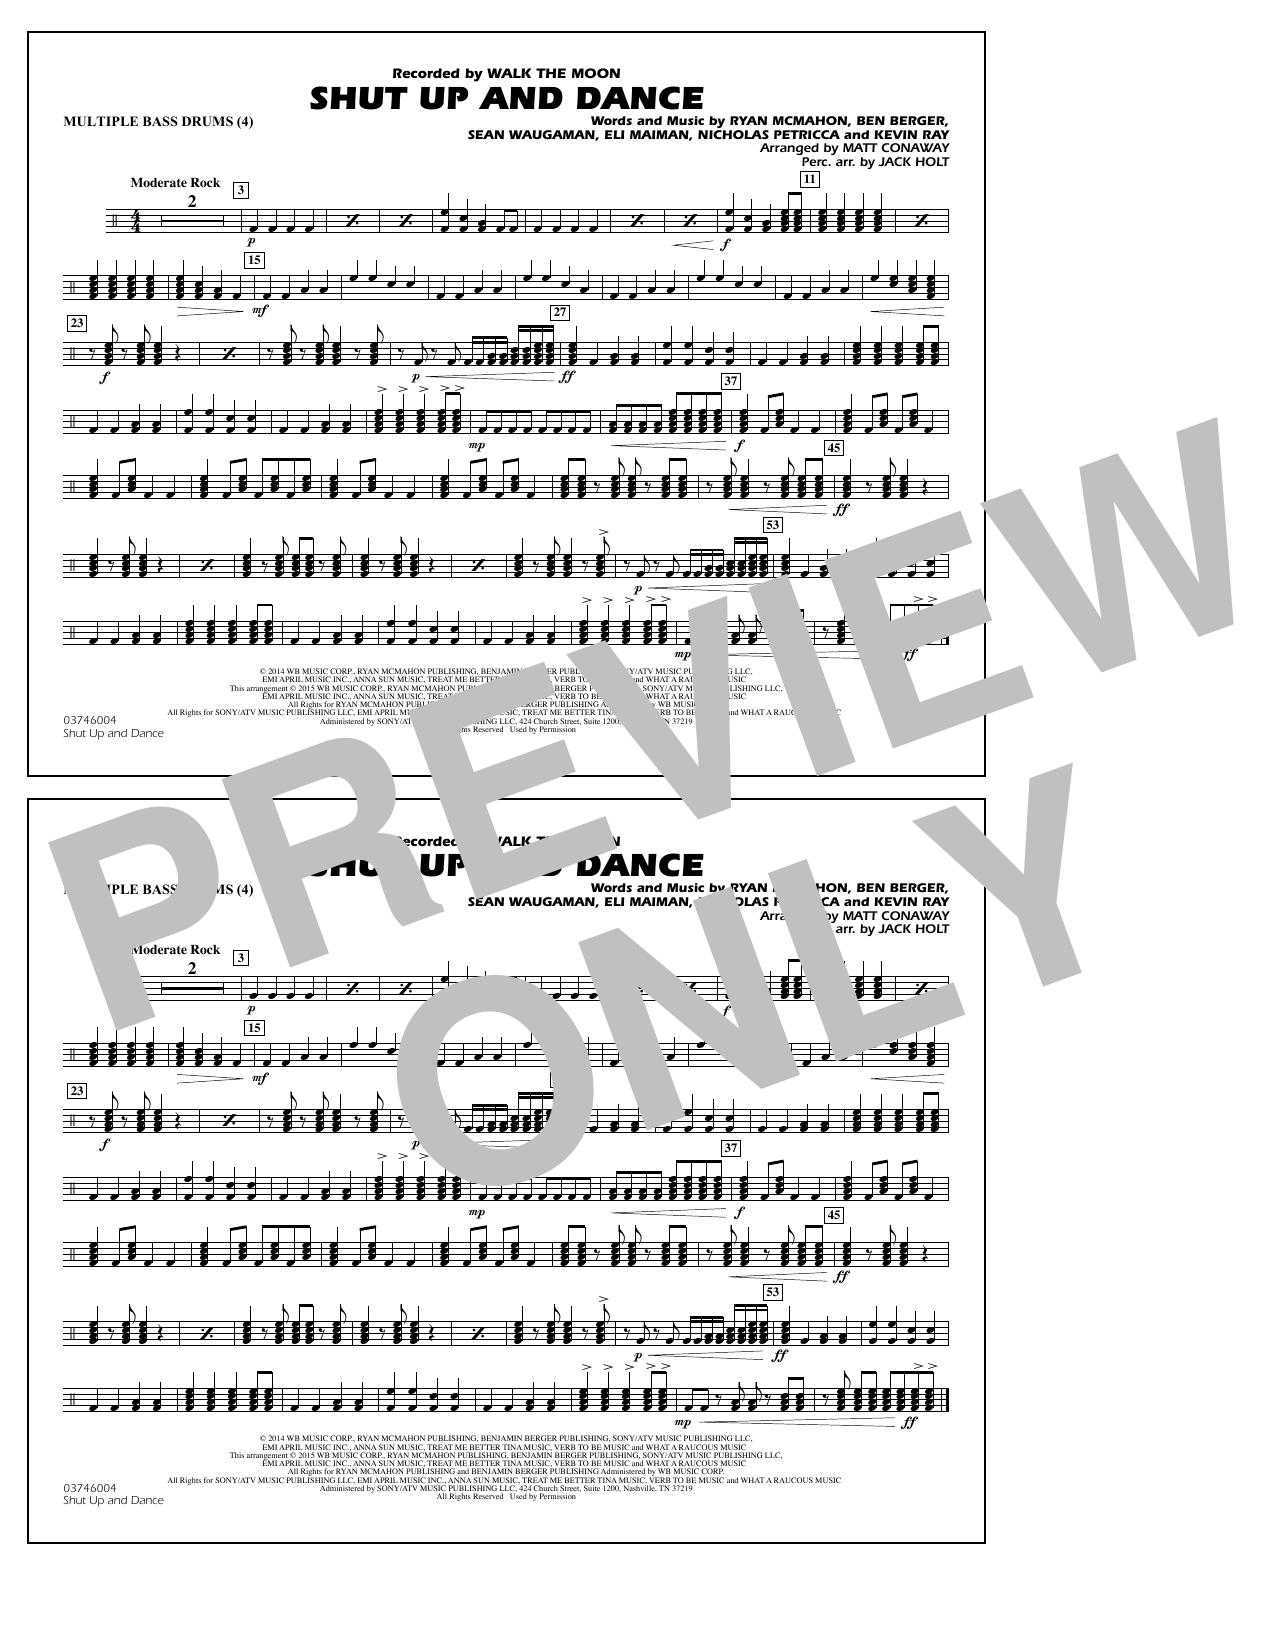 Walk The Moon Shut Up and Dance (Arr. Matt Conaway) - Multiple Bass Drums sheet music notes and chords